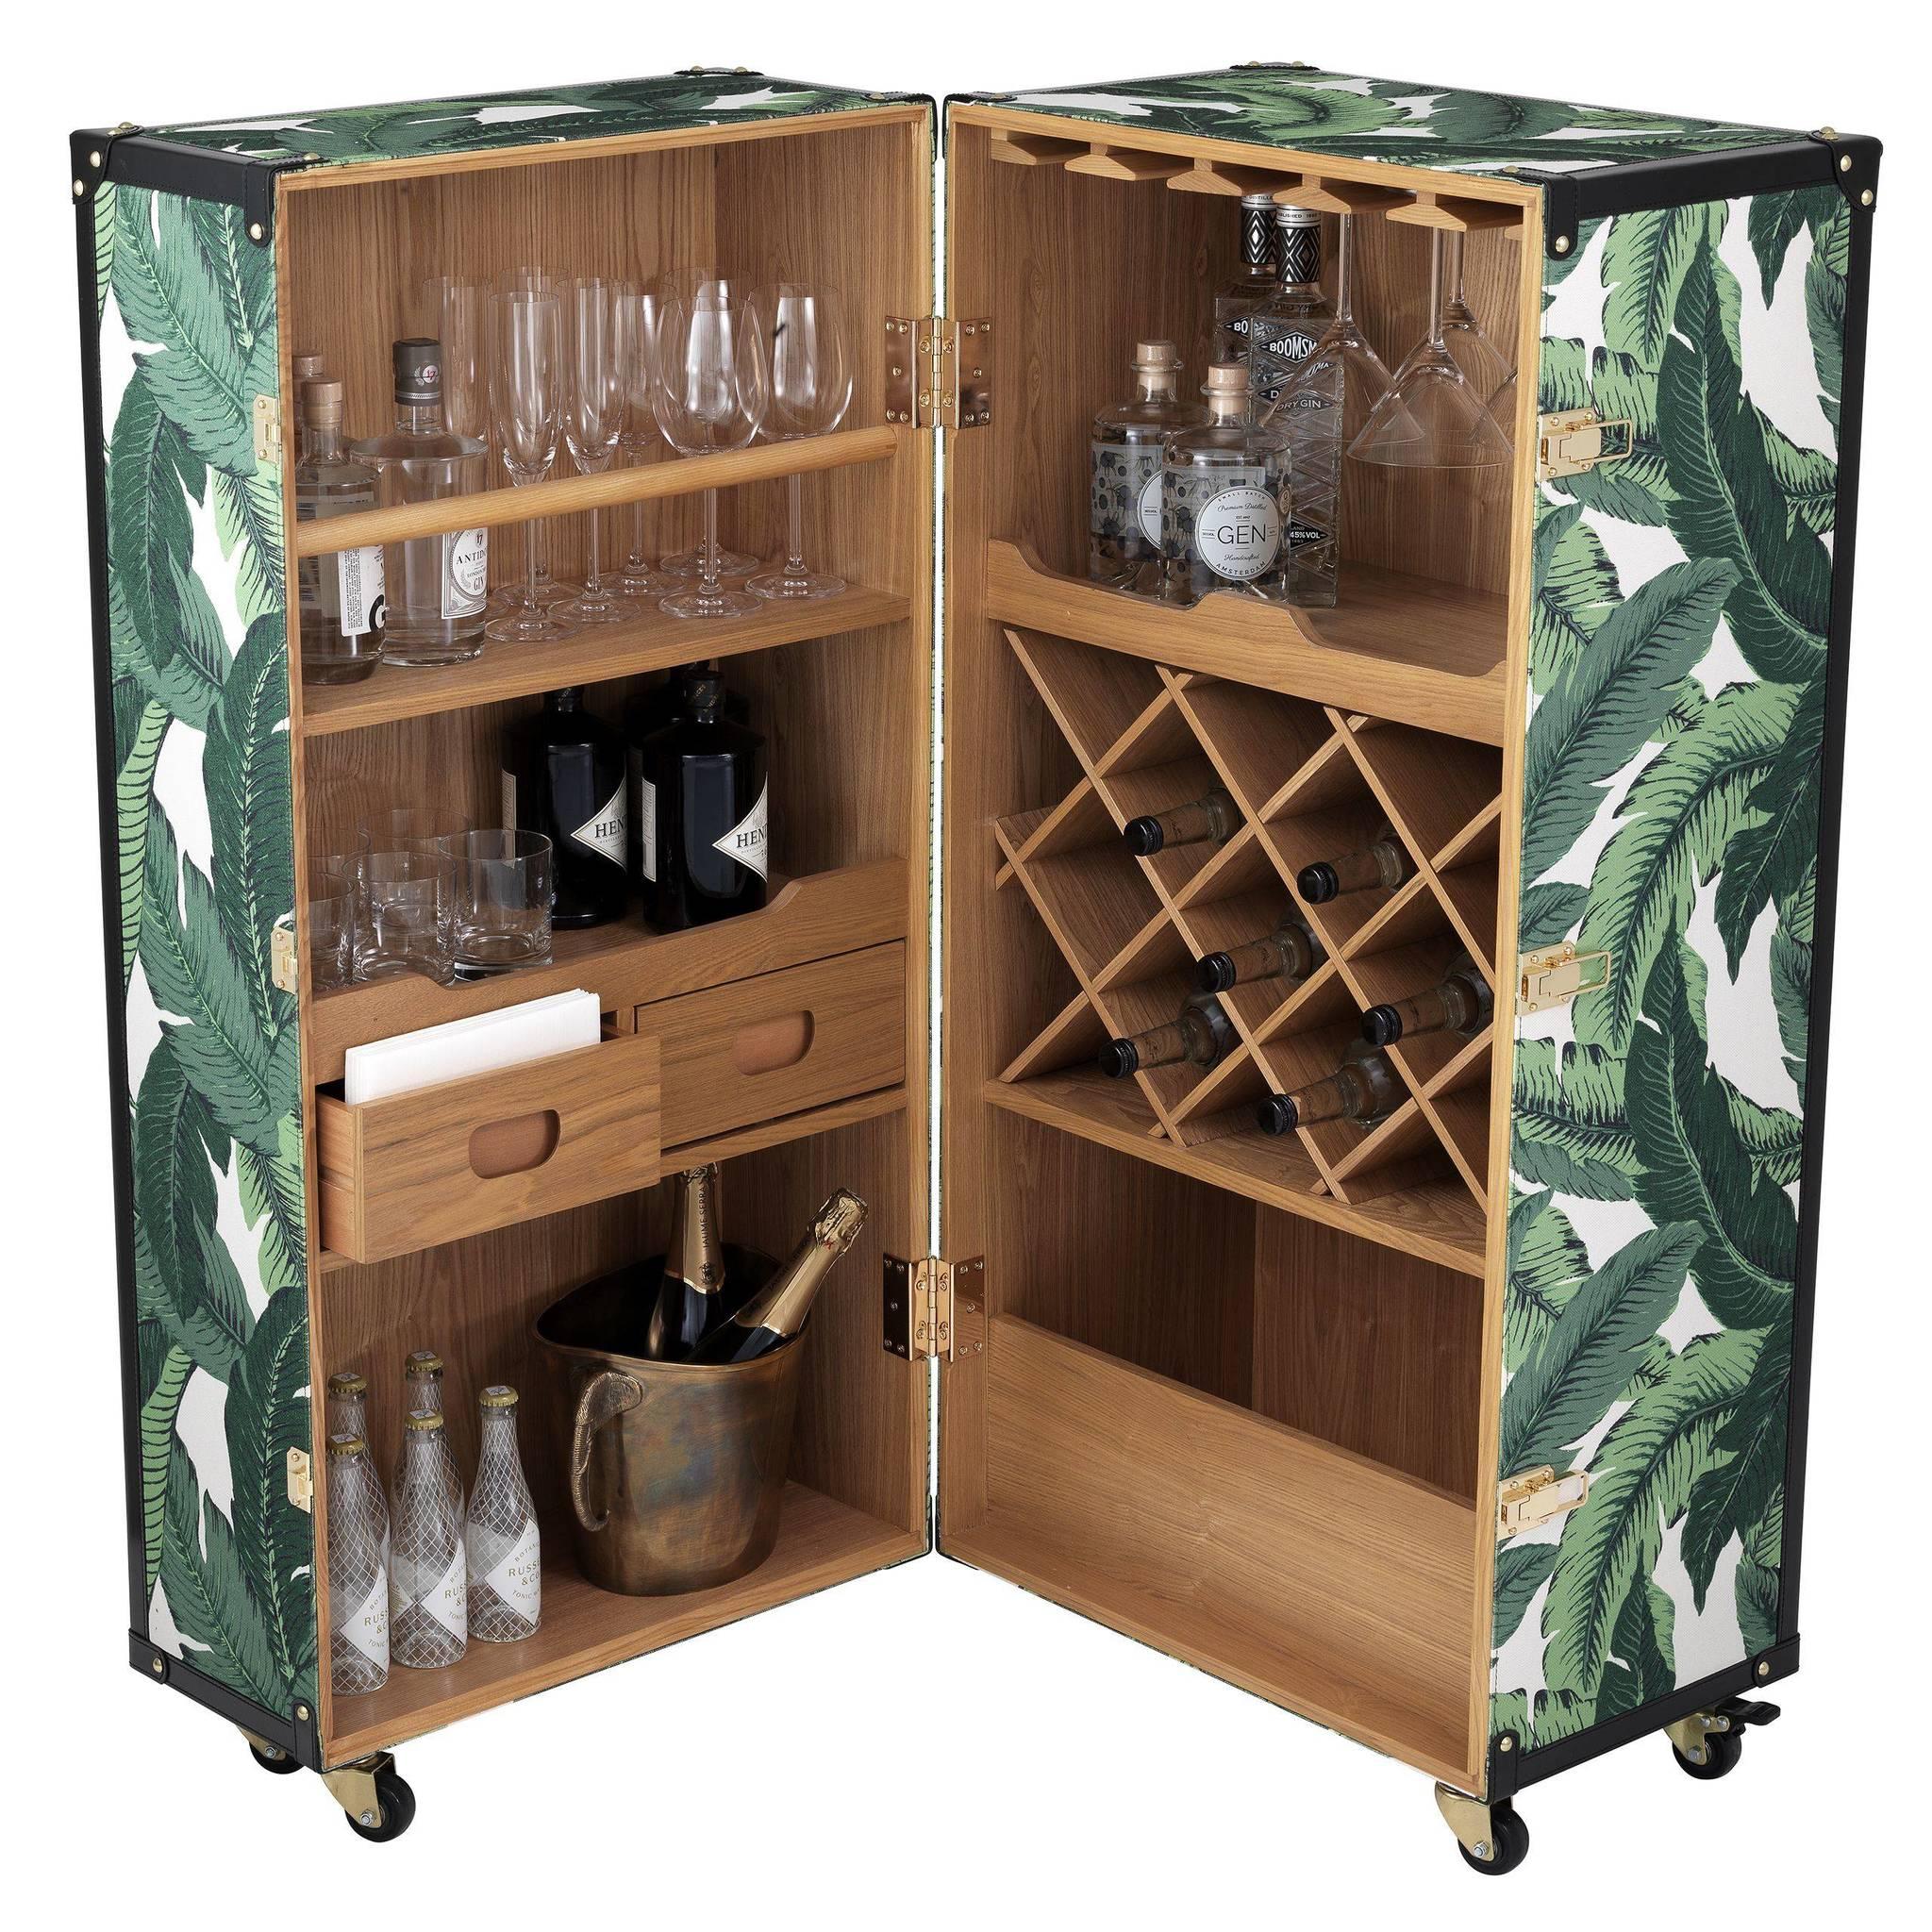 Винный шкаф Eichholtz 114020 Martini Bianco